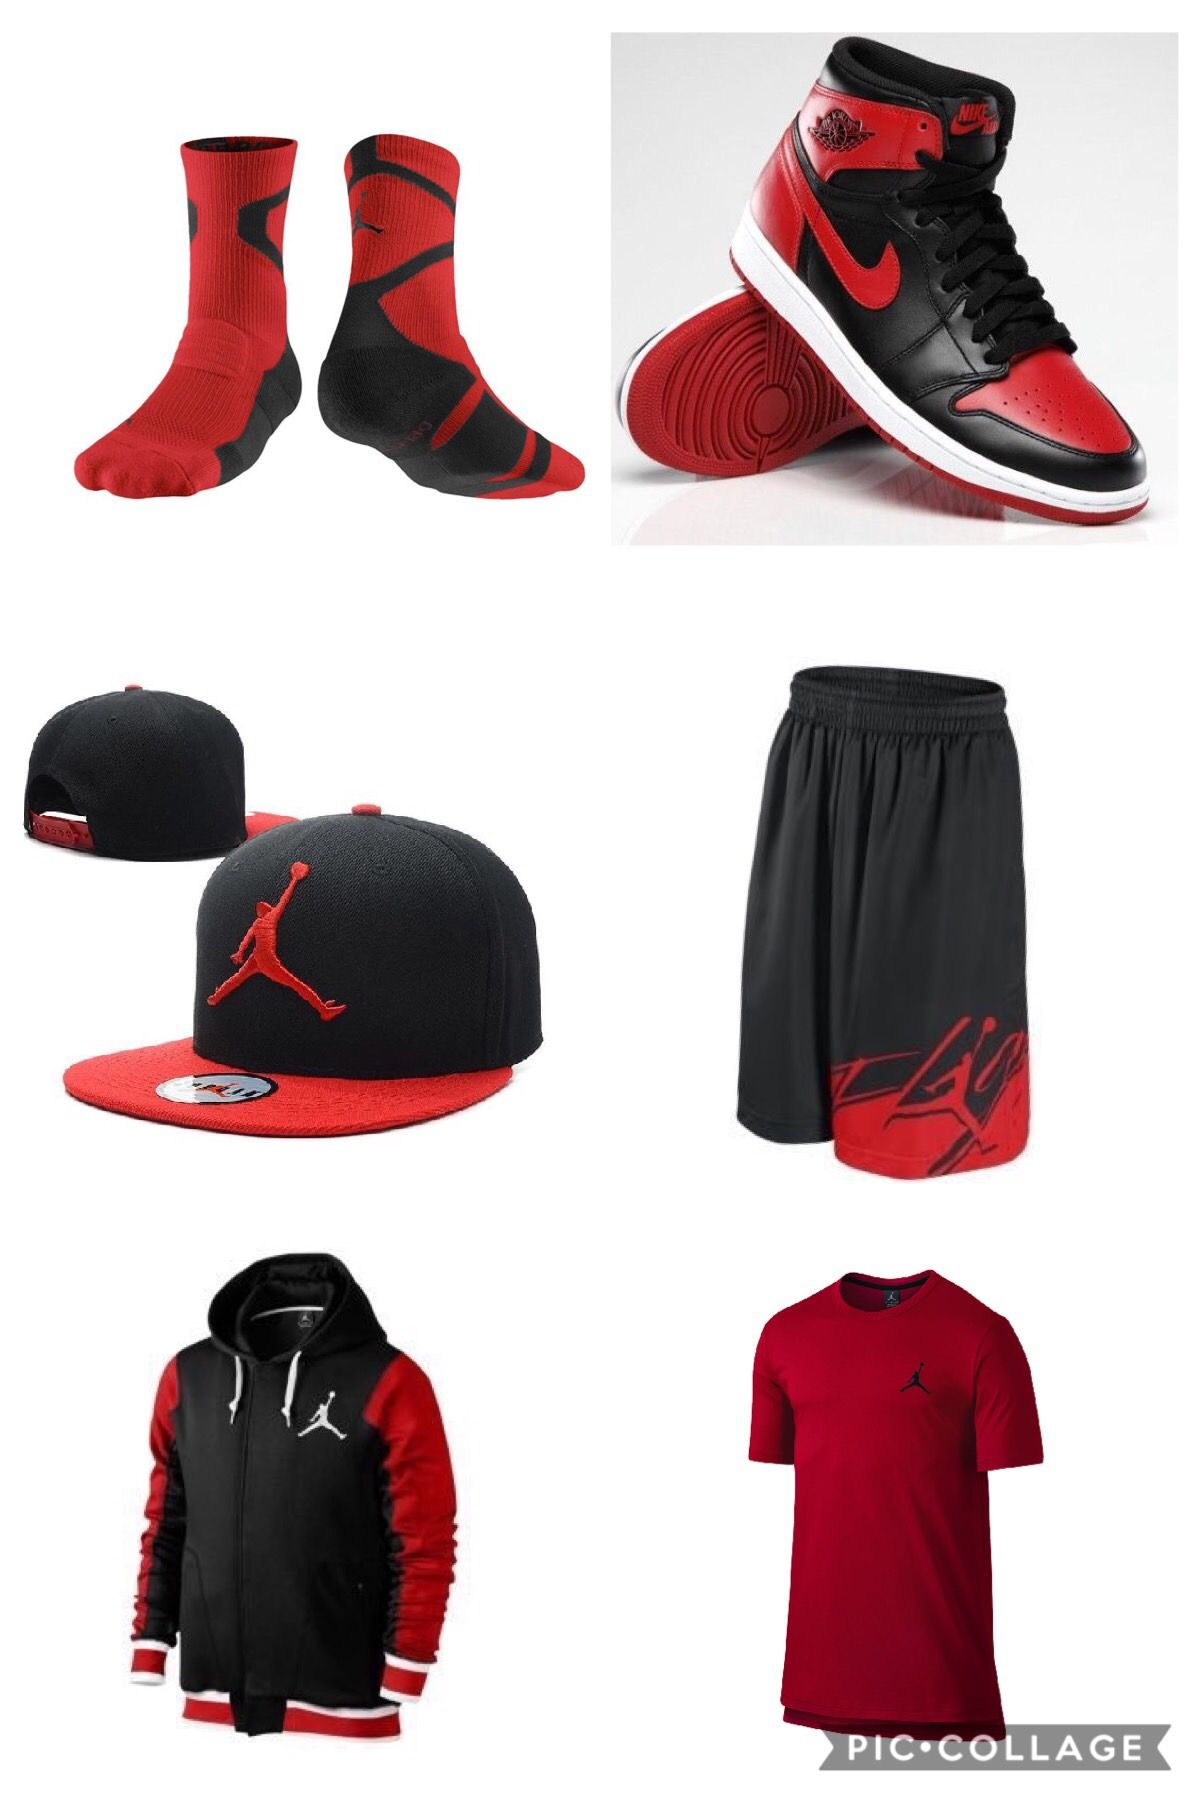 fbefac30822b4e Red Black Jordan Outfit